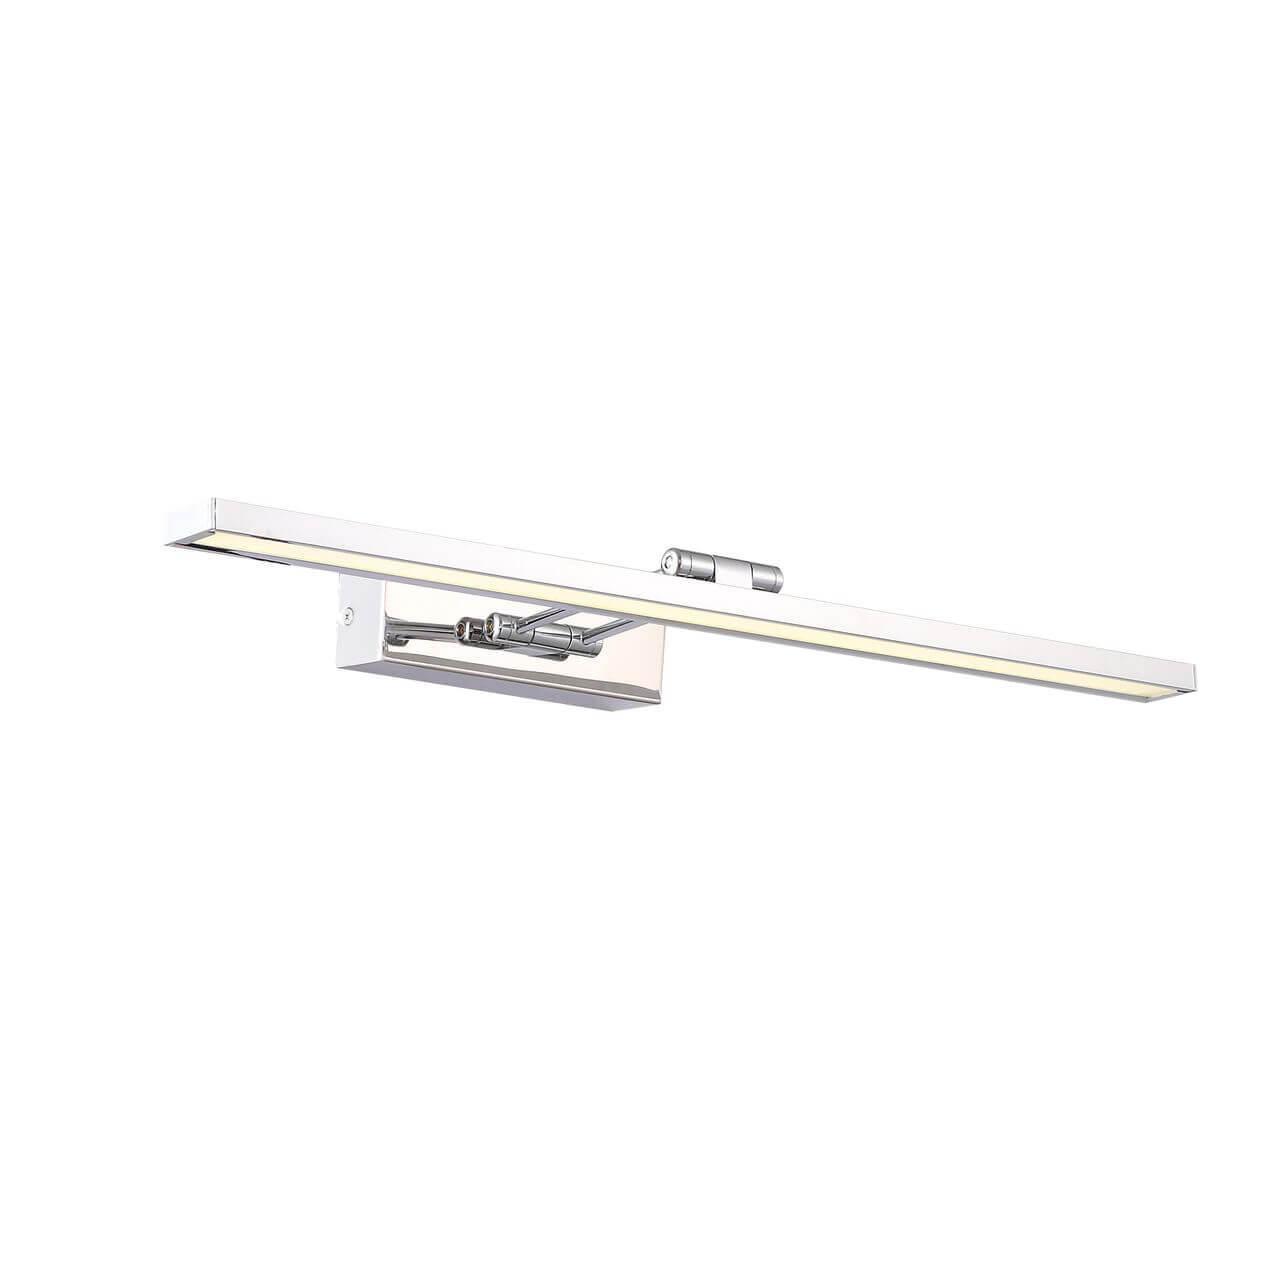 Подсветка для картин ST Luce SL445.101.01 Parallela подсветка для картин st luce illuminazione sl574 401 04